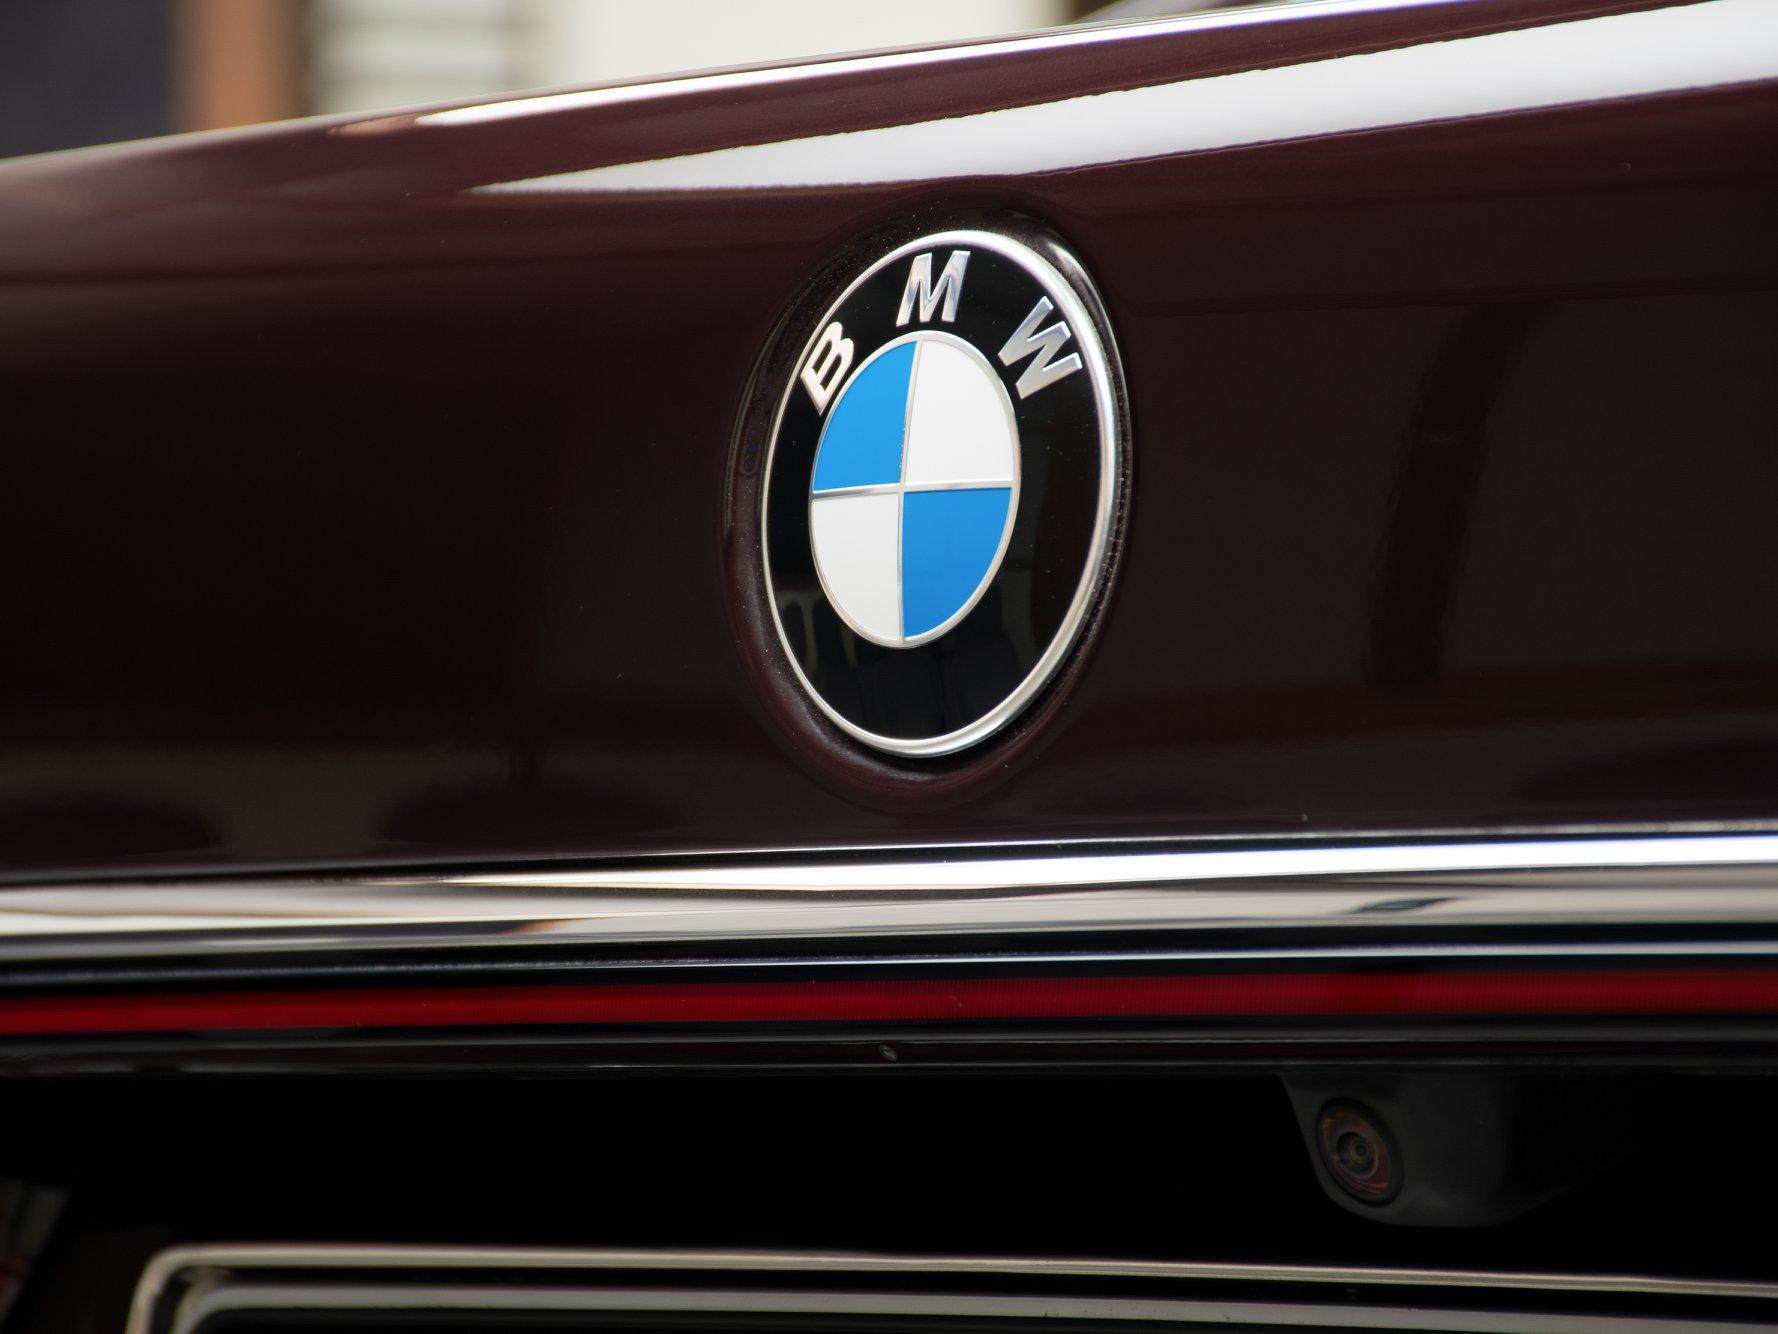 2020_BMW_750Li_Royal_Burgundy_Red_0023